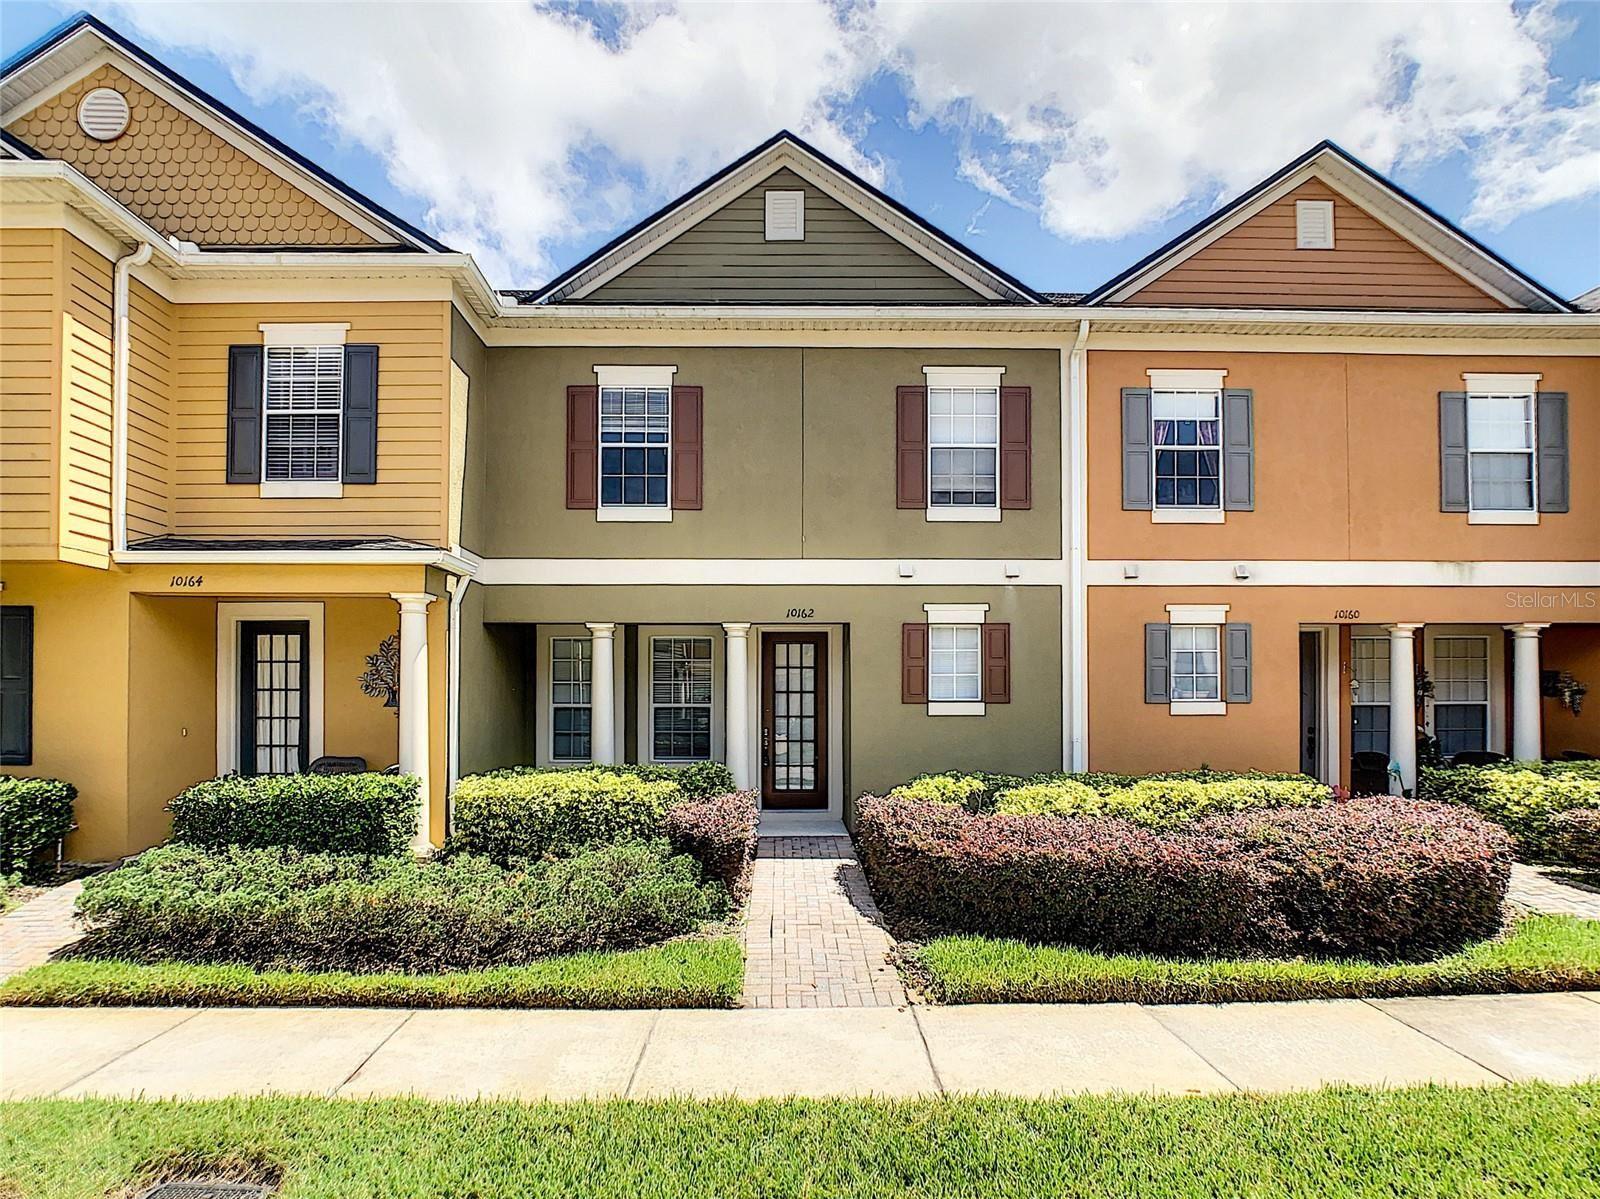 10162 RIDGEBLOOM AVENUE, Orlando, FL 32829 - MLS#: O5955397